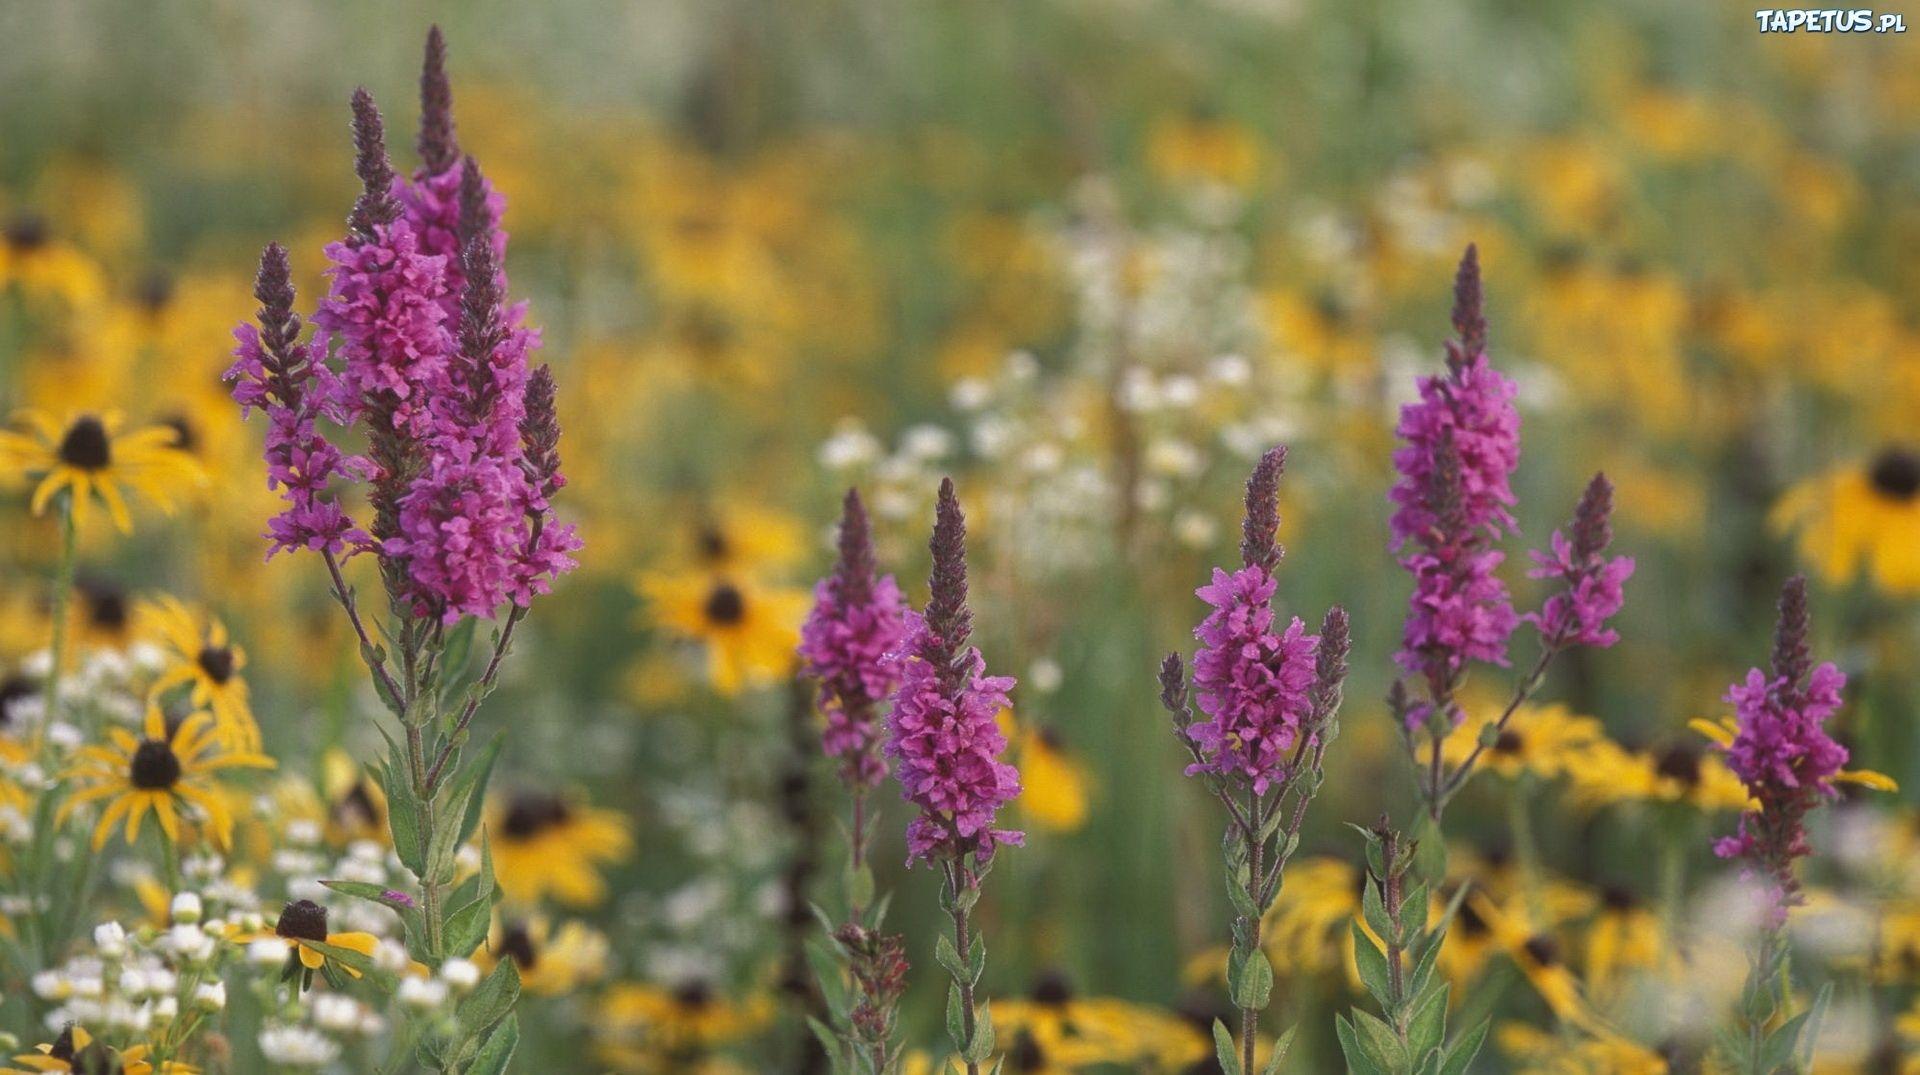 Laka Kwiaty Polne Tapety Wild Flowers Scenery Pictures Purple Loosestrife